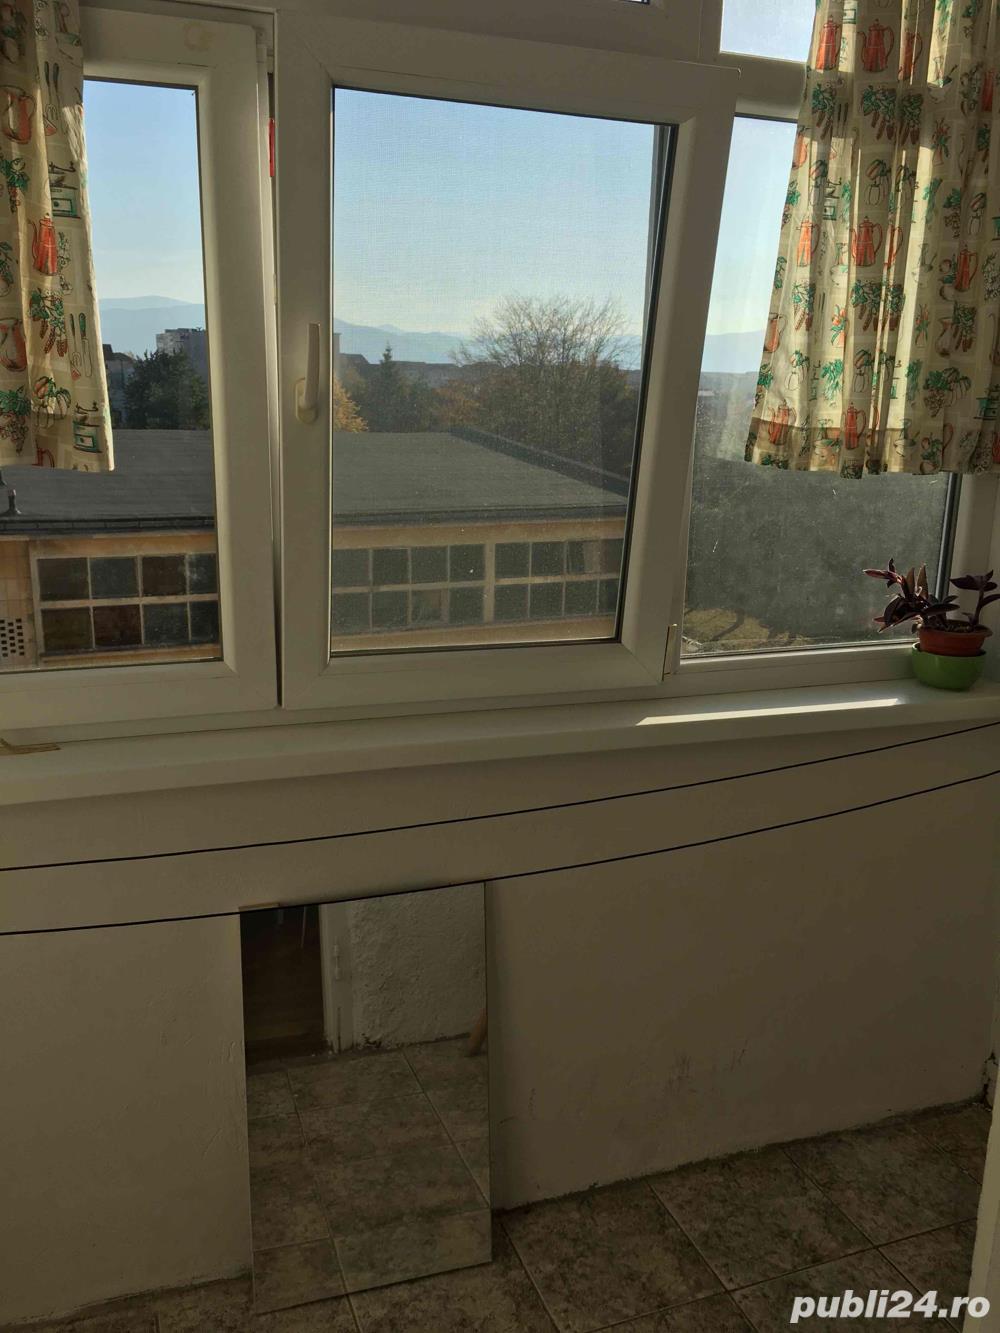 Apartament 2 camere decomamdat, pivnita, str Nicolae Iorga, 52900 euro